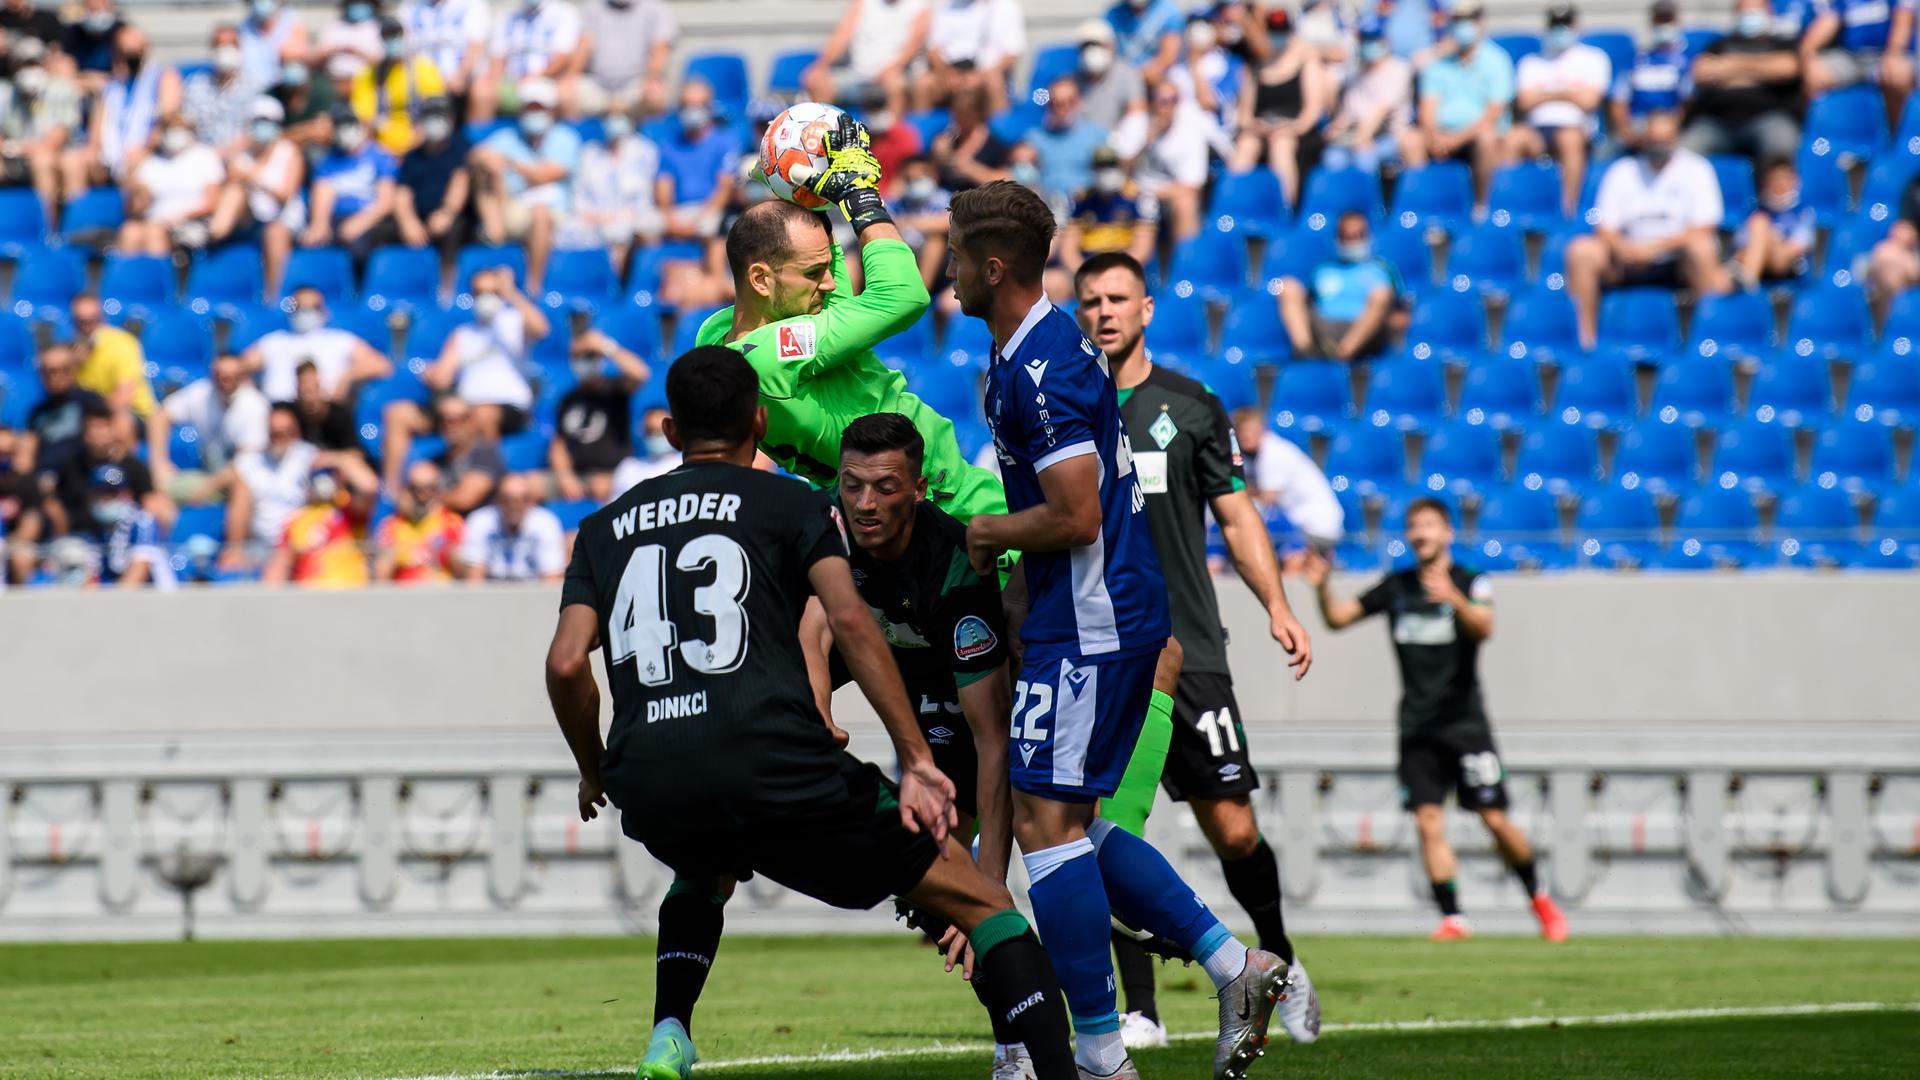 Torwart Marius Gersbeck (KSC) haelt.  GES/ Fussball/ 2. Bundesliga: Karlsruher SC- SV Werder Bremen, 21.08.2021  Football / Soccer: 2nd German League: Karlsruhe vs Bremen, August 21, 2021